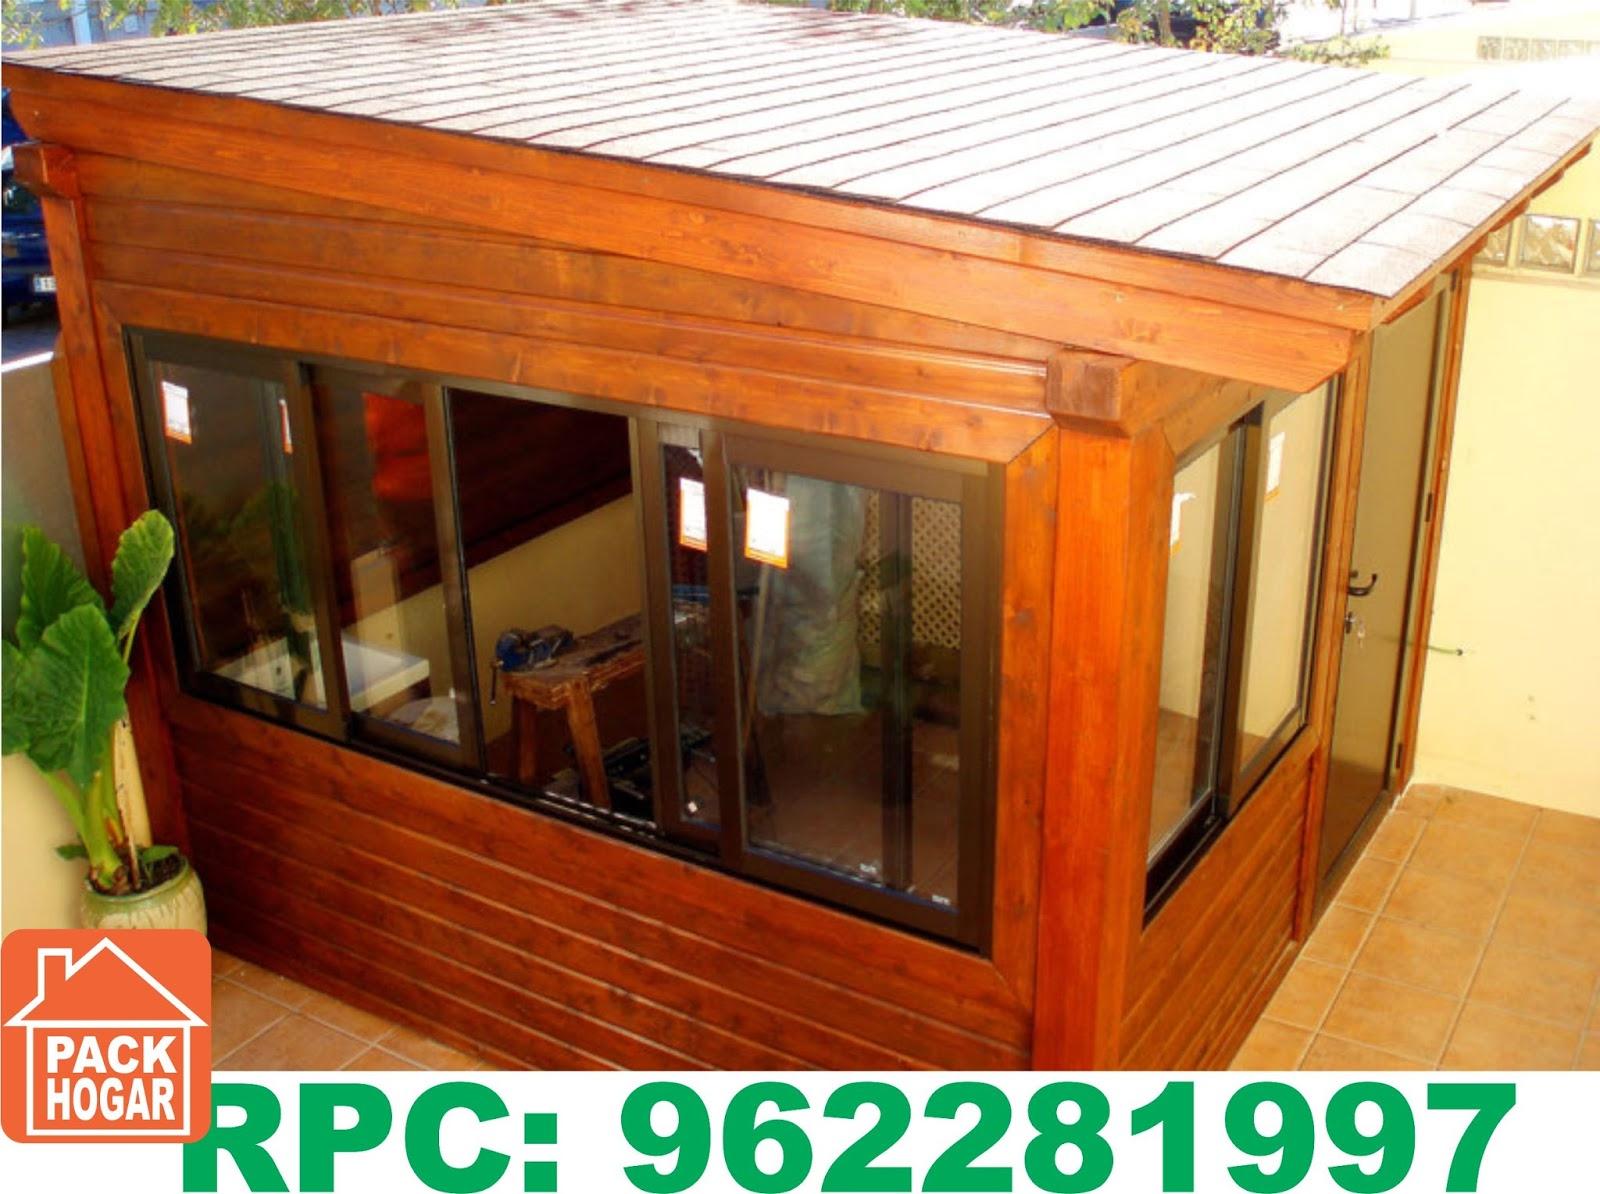 Casetas modulos prefabricadas de madera for Casetas madera jardin baratas